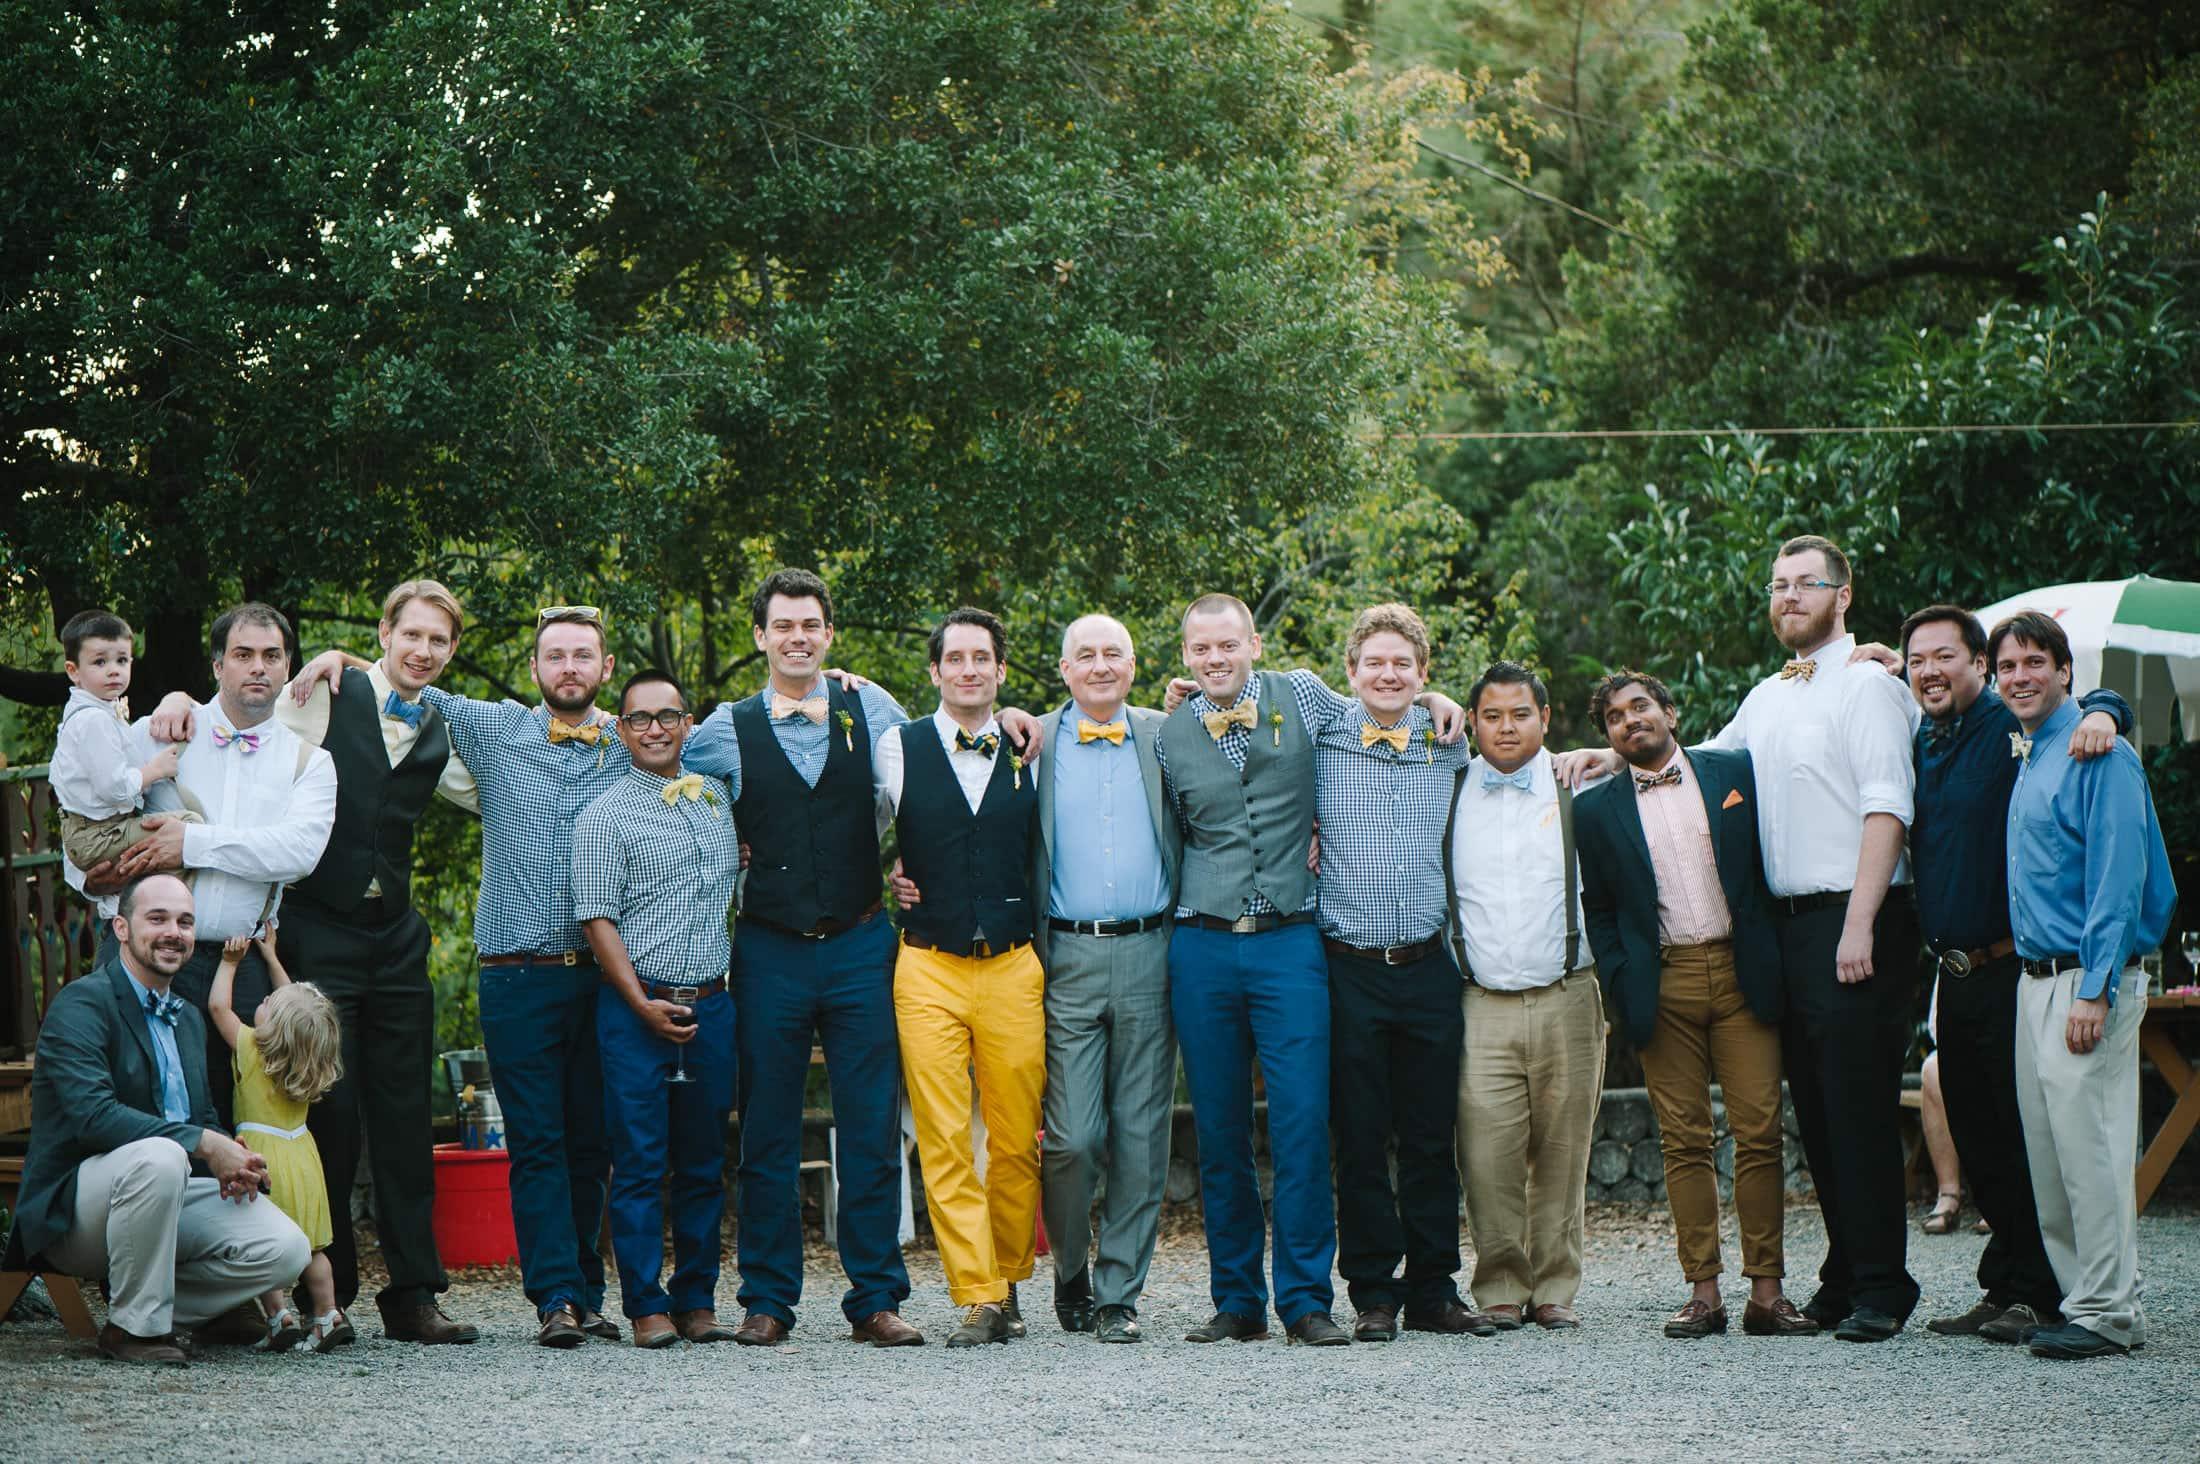 fun groom's men at wedding at oakland nature friends